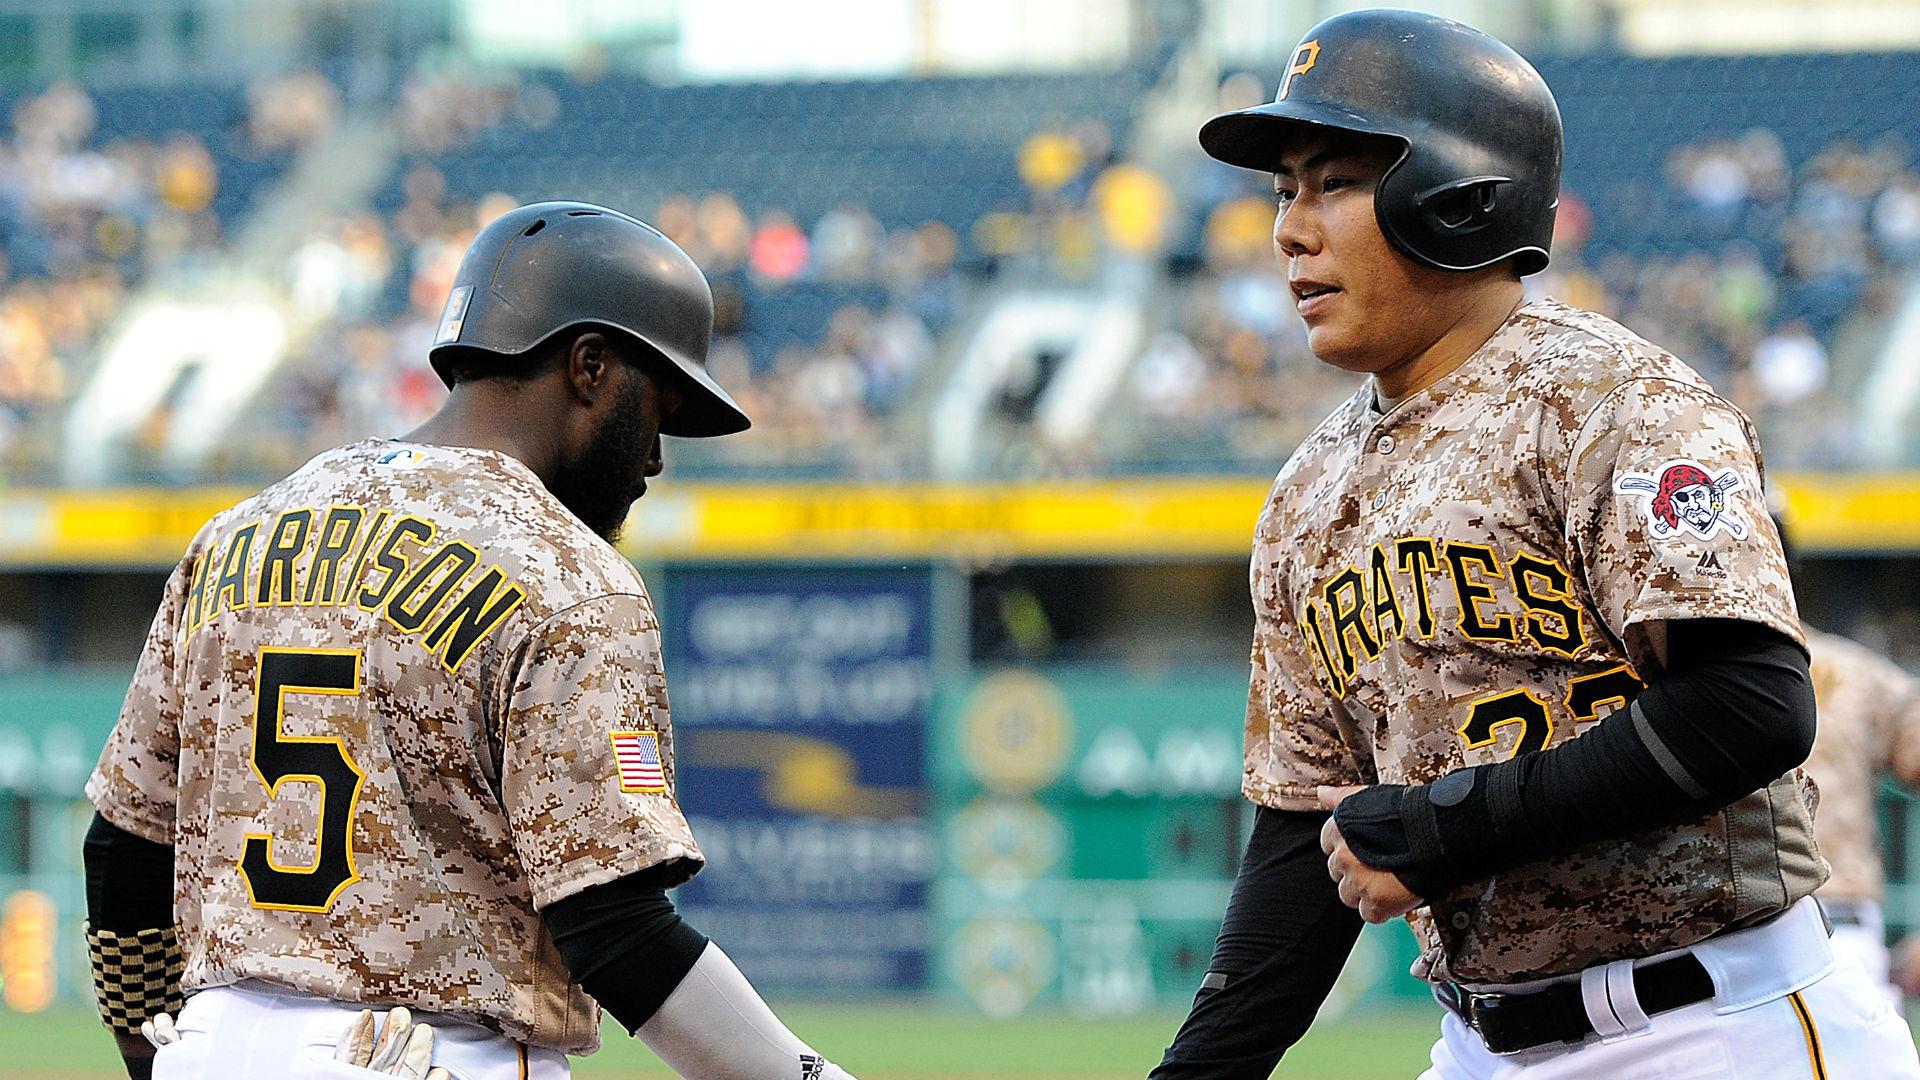 MLB free agency rumors: Pirates decline options for Josh Harrison, Jung Ho Kang